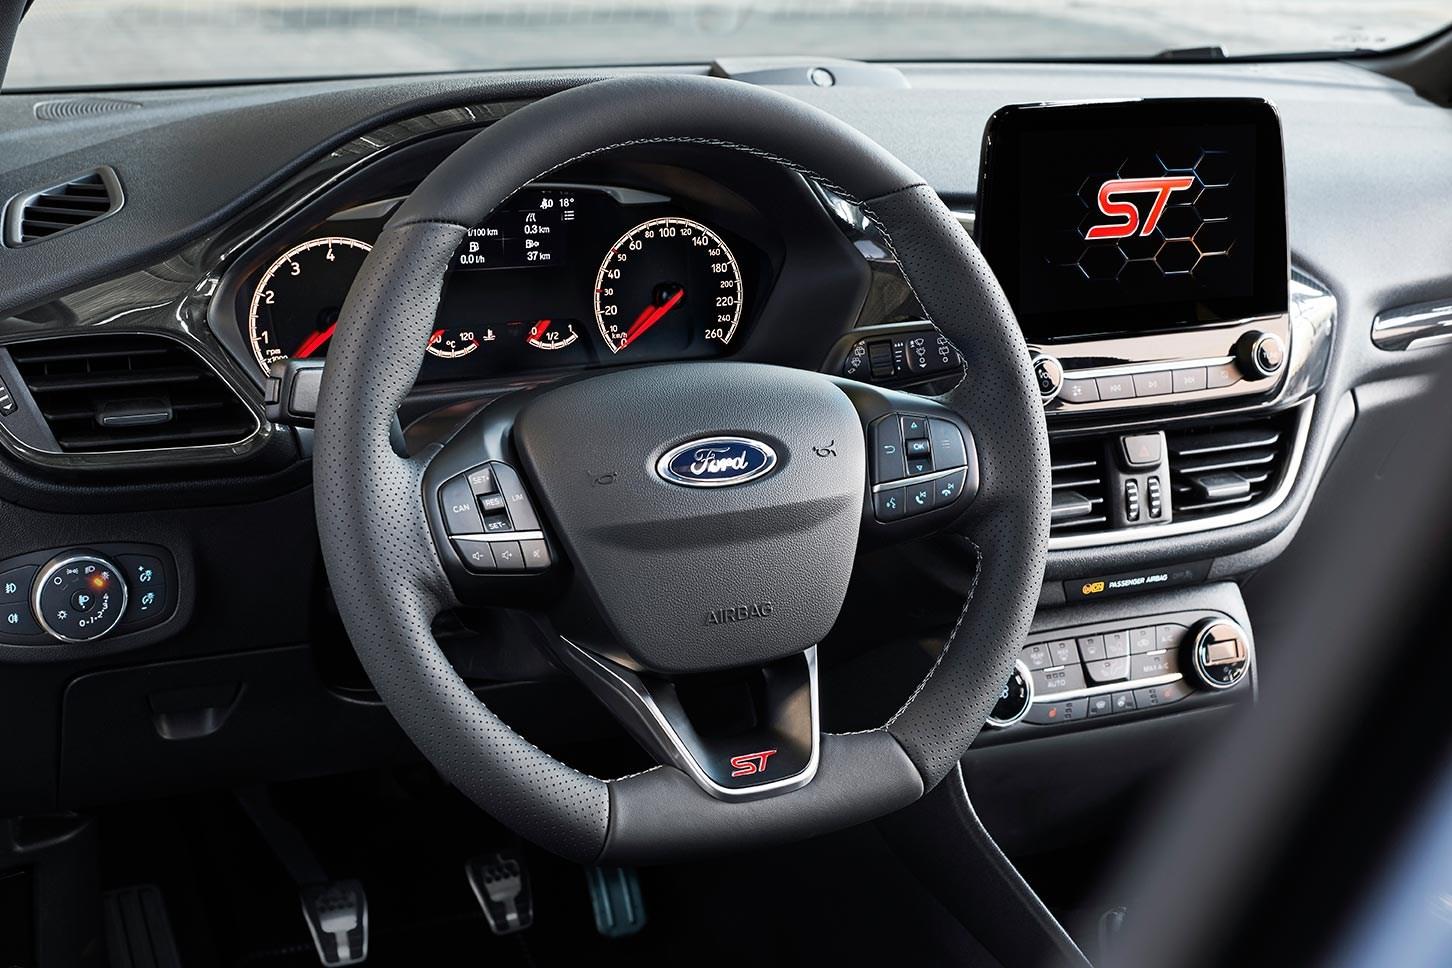 fiesta-st-steering-wheel_1800x1800